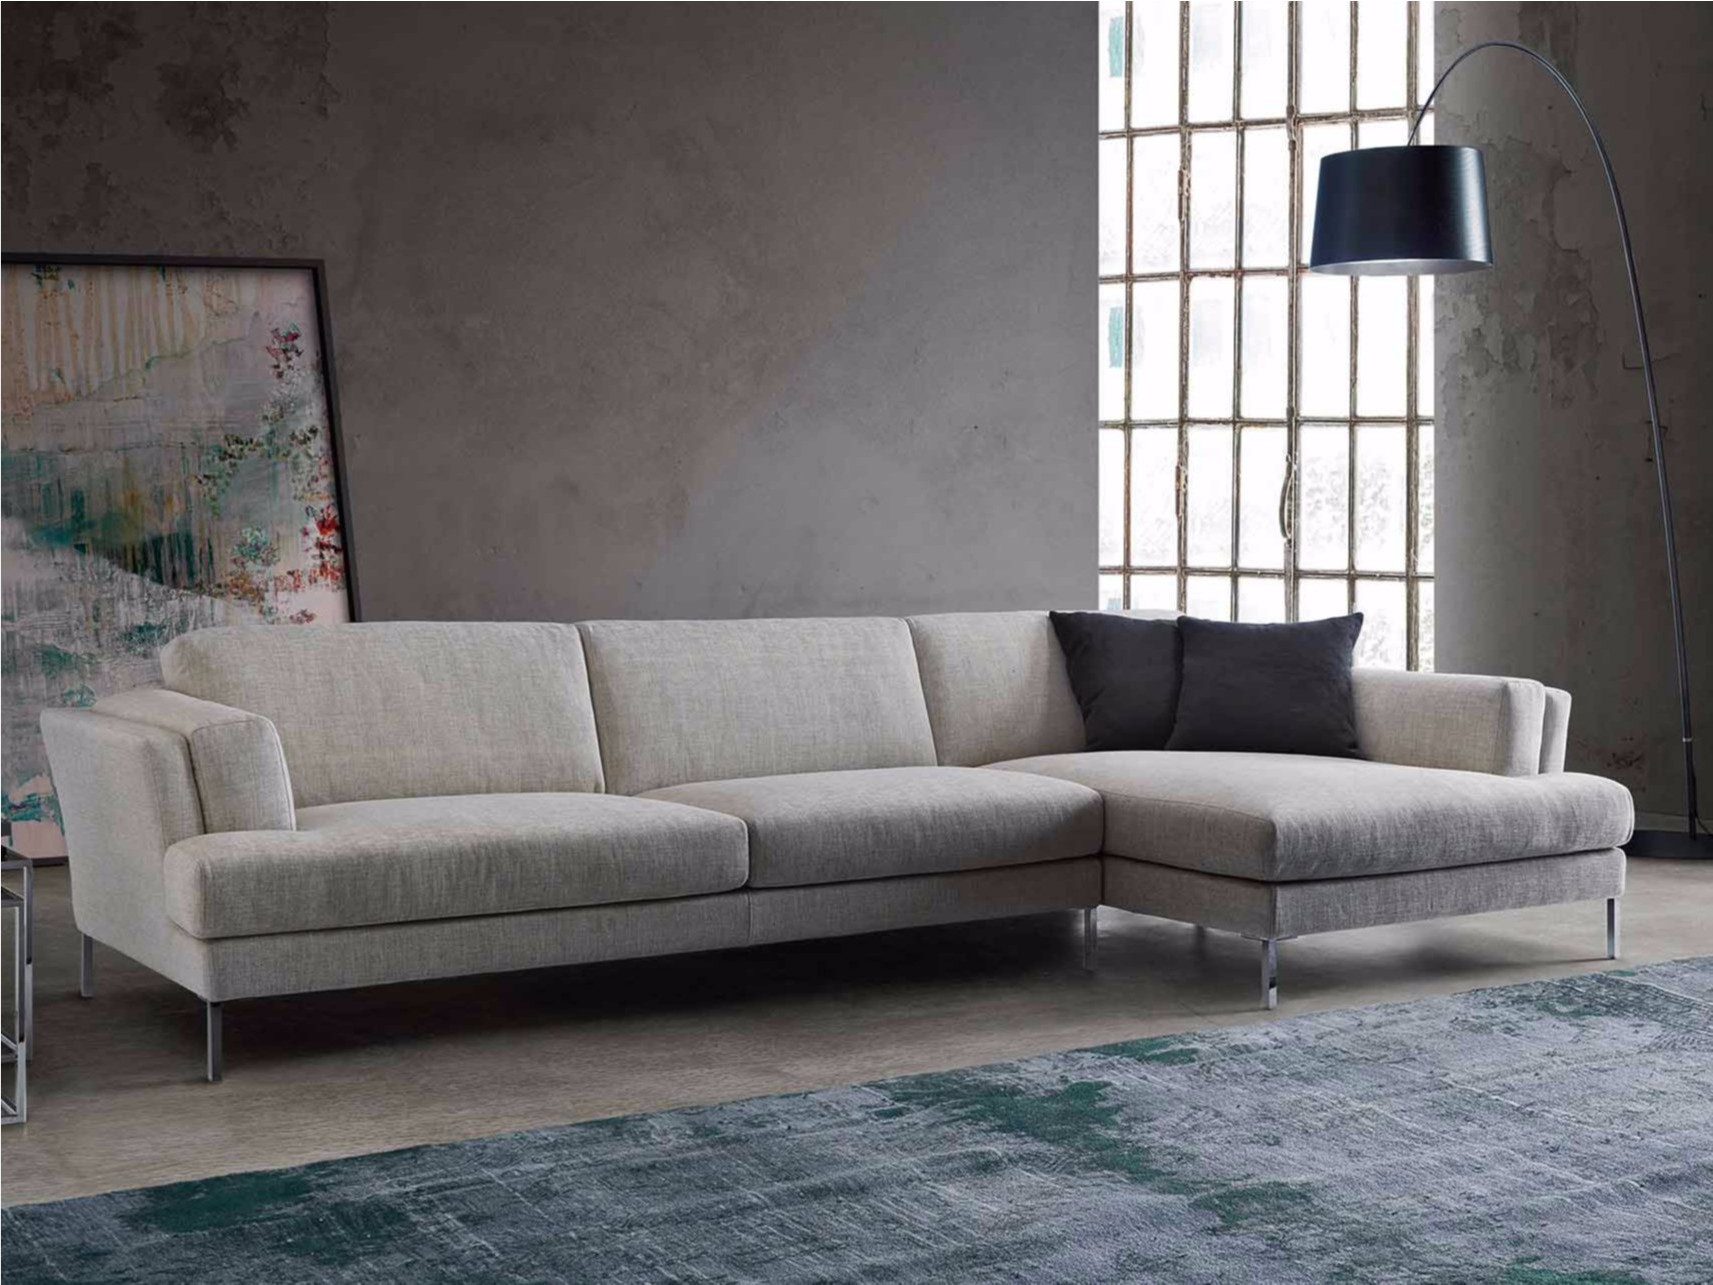 canape angle cuir noir fly canap id es de d coration. Black Bedroom Furniture Sets. Home Design Ideas